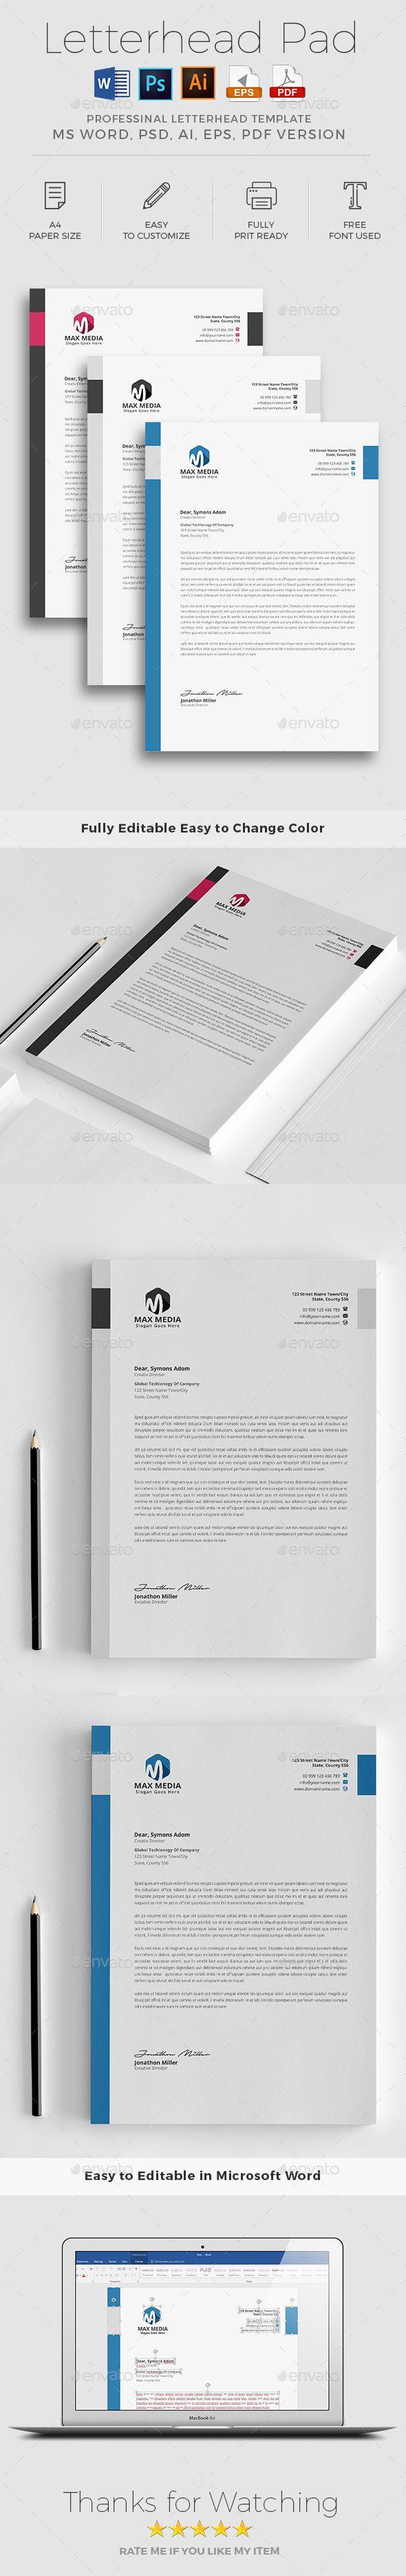 Letterhead — Photoshop PSD #letterhead #presentation folder • Download ➝ https://graphicriver.net/item/letterhead/19126470?ref=pxcr